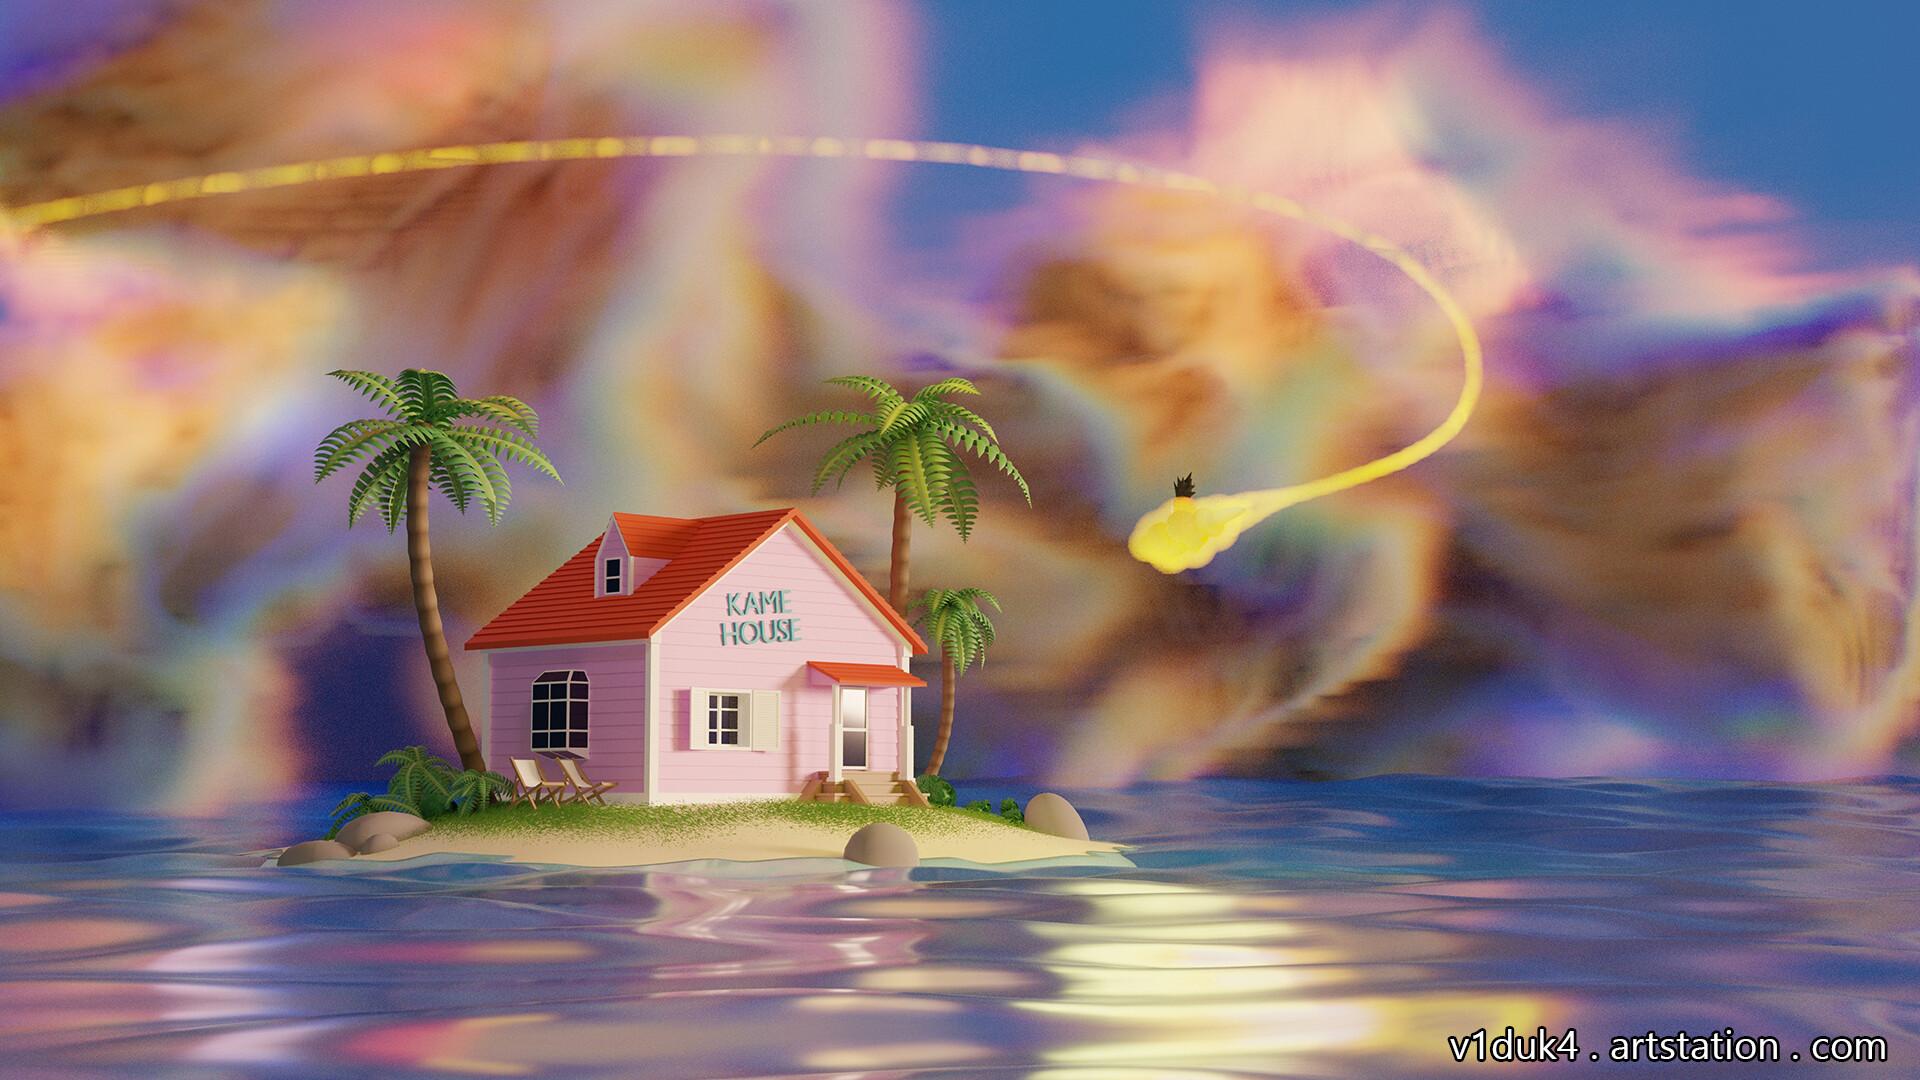 ArtStation - Dragon Ball : Kame House 3D, Daniel SG